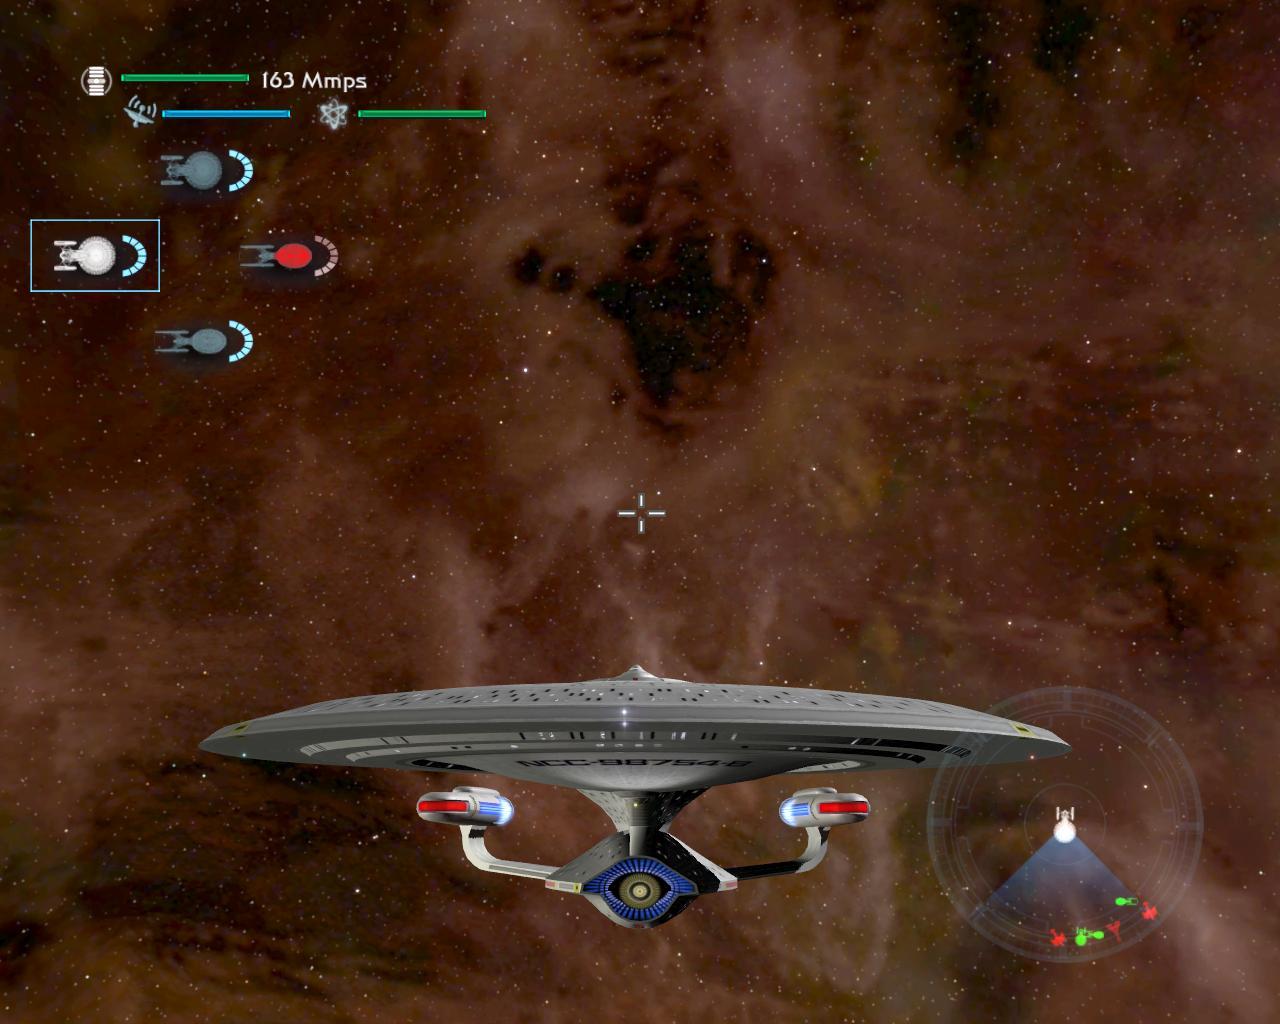 Star trek legacy (2006)